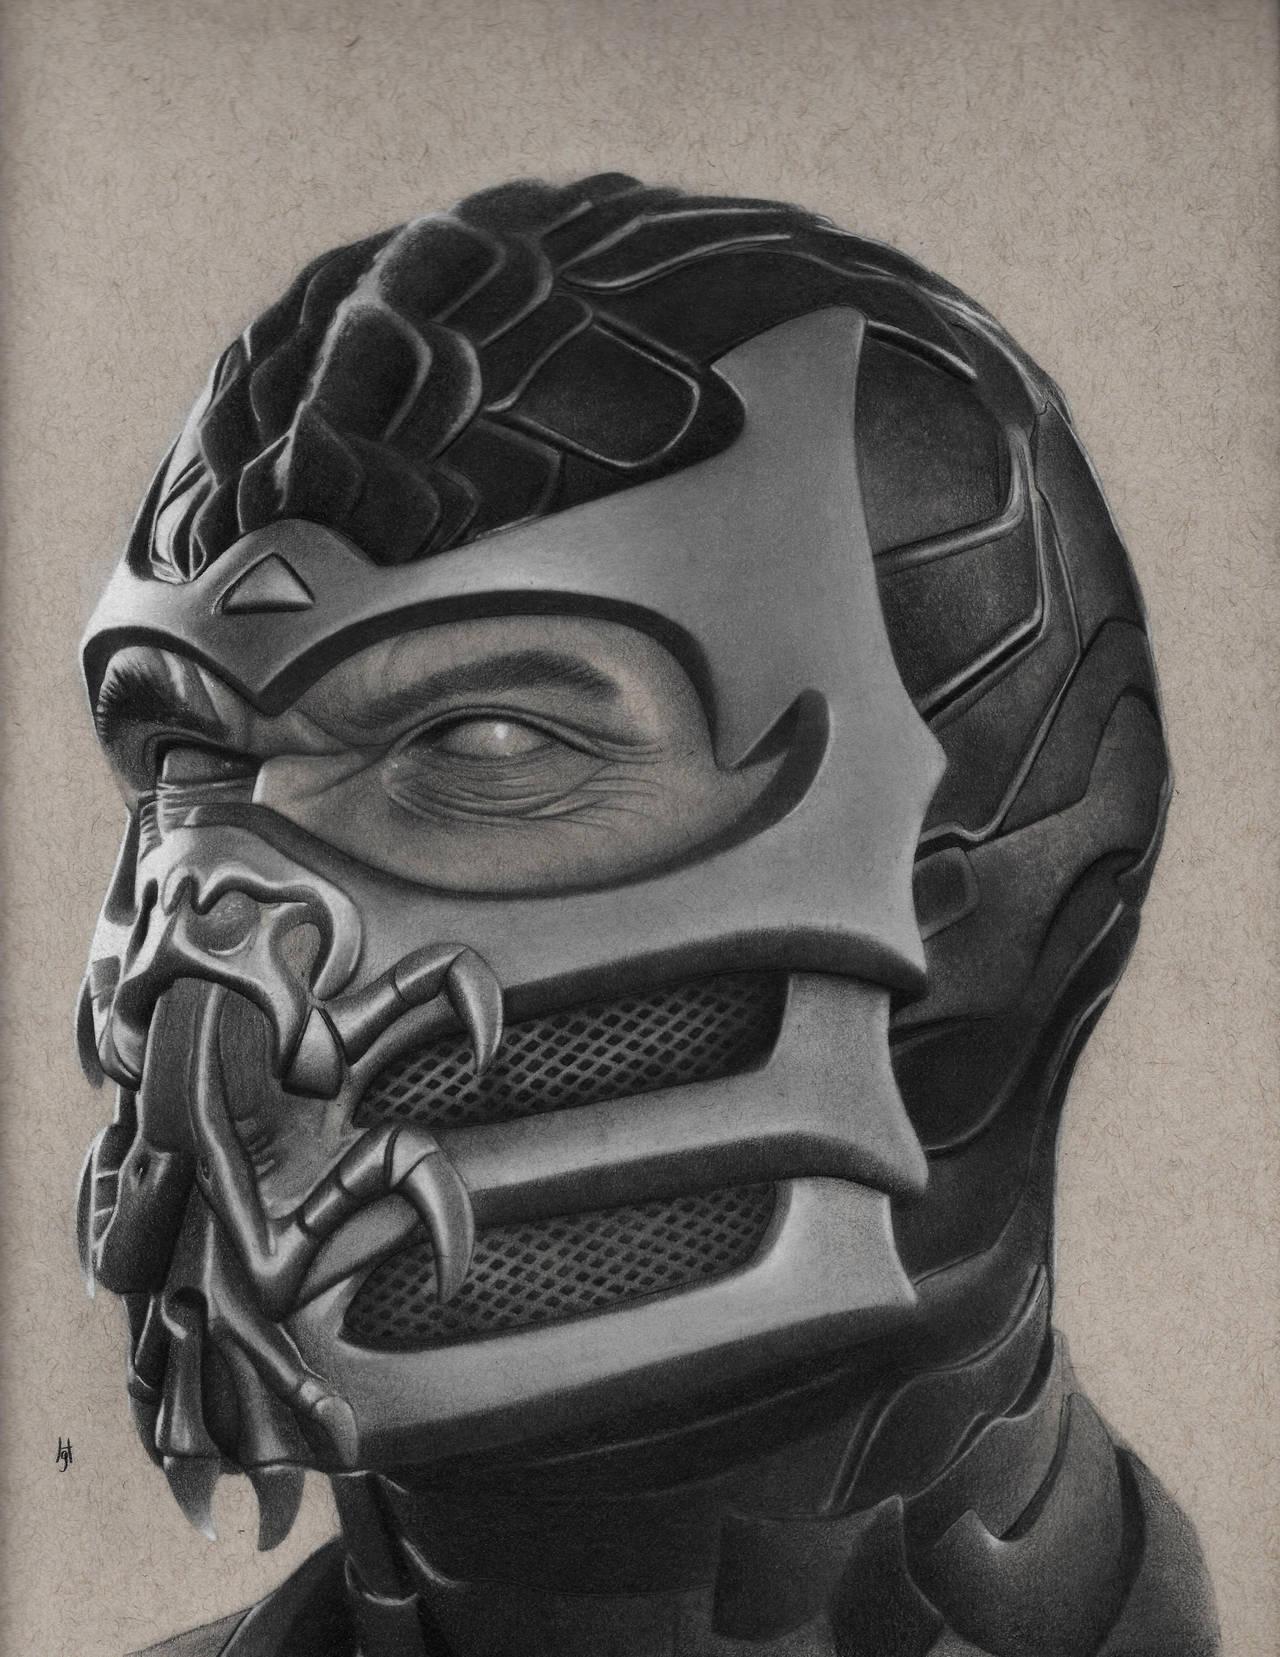 Scorpion Drawing by hg-art